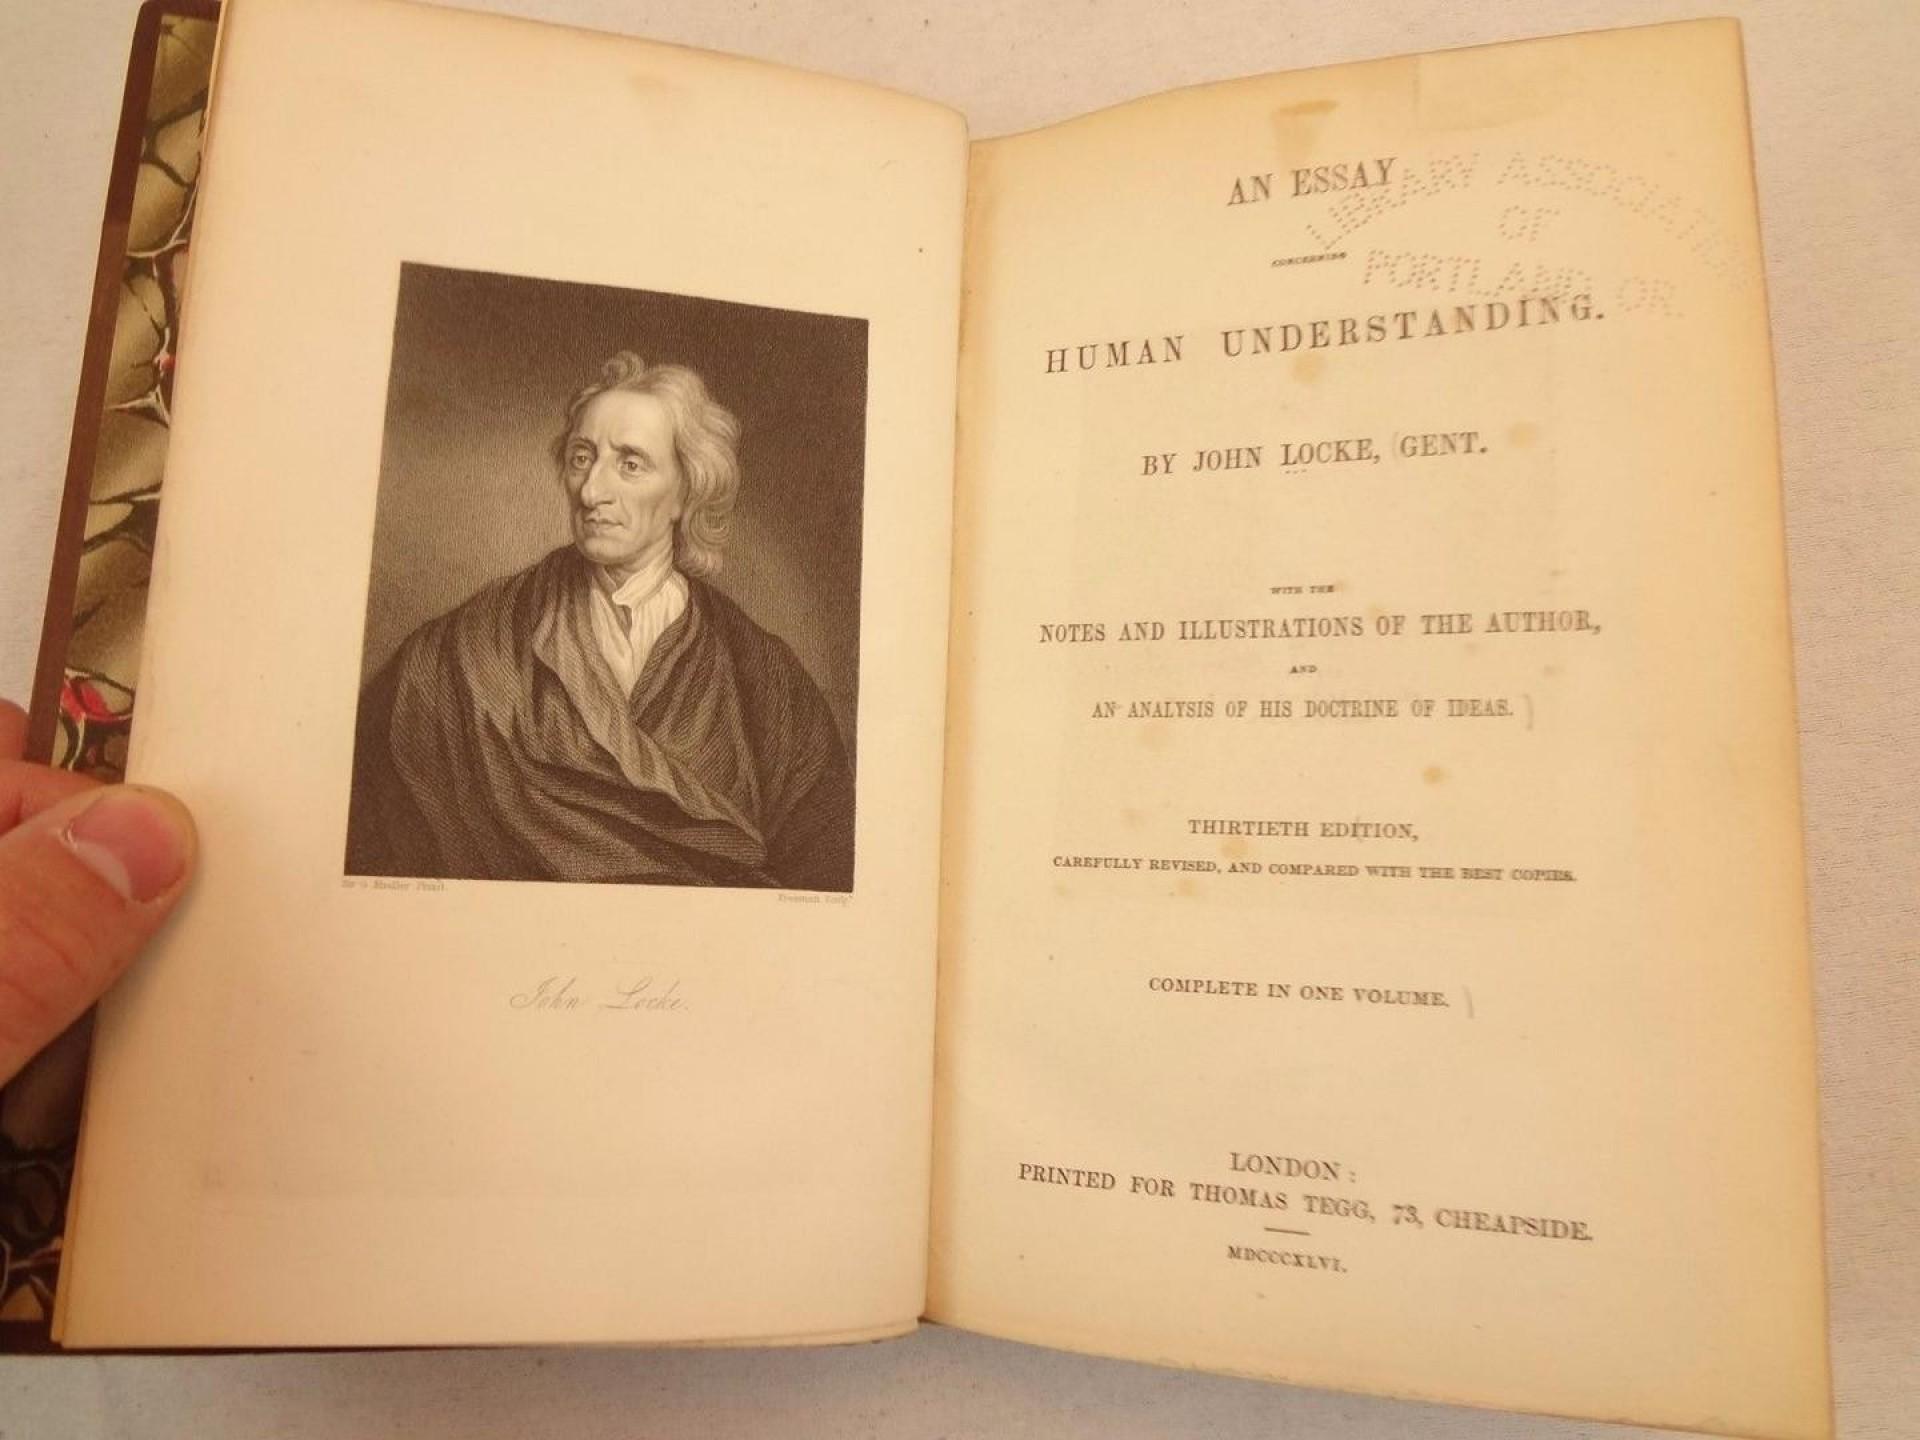 012 Essay Example John Locke Human 1 5c9342489ac77b9c4debab3d676d80b1 Impressive Concerning Understanding Book 4 On Pdf Summary 1920